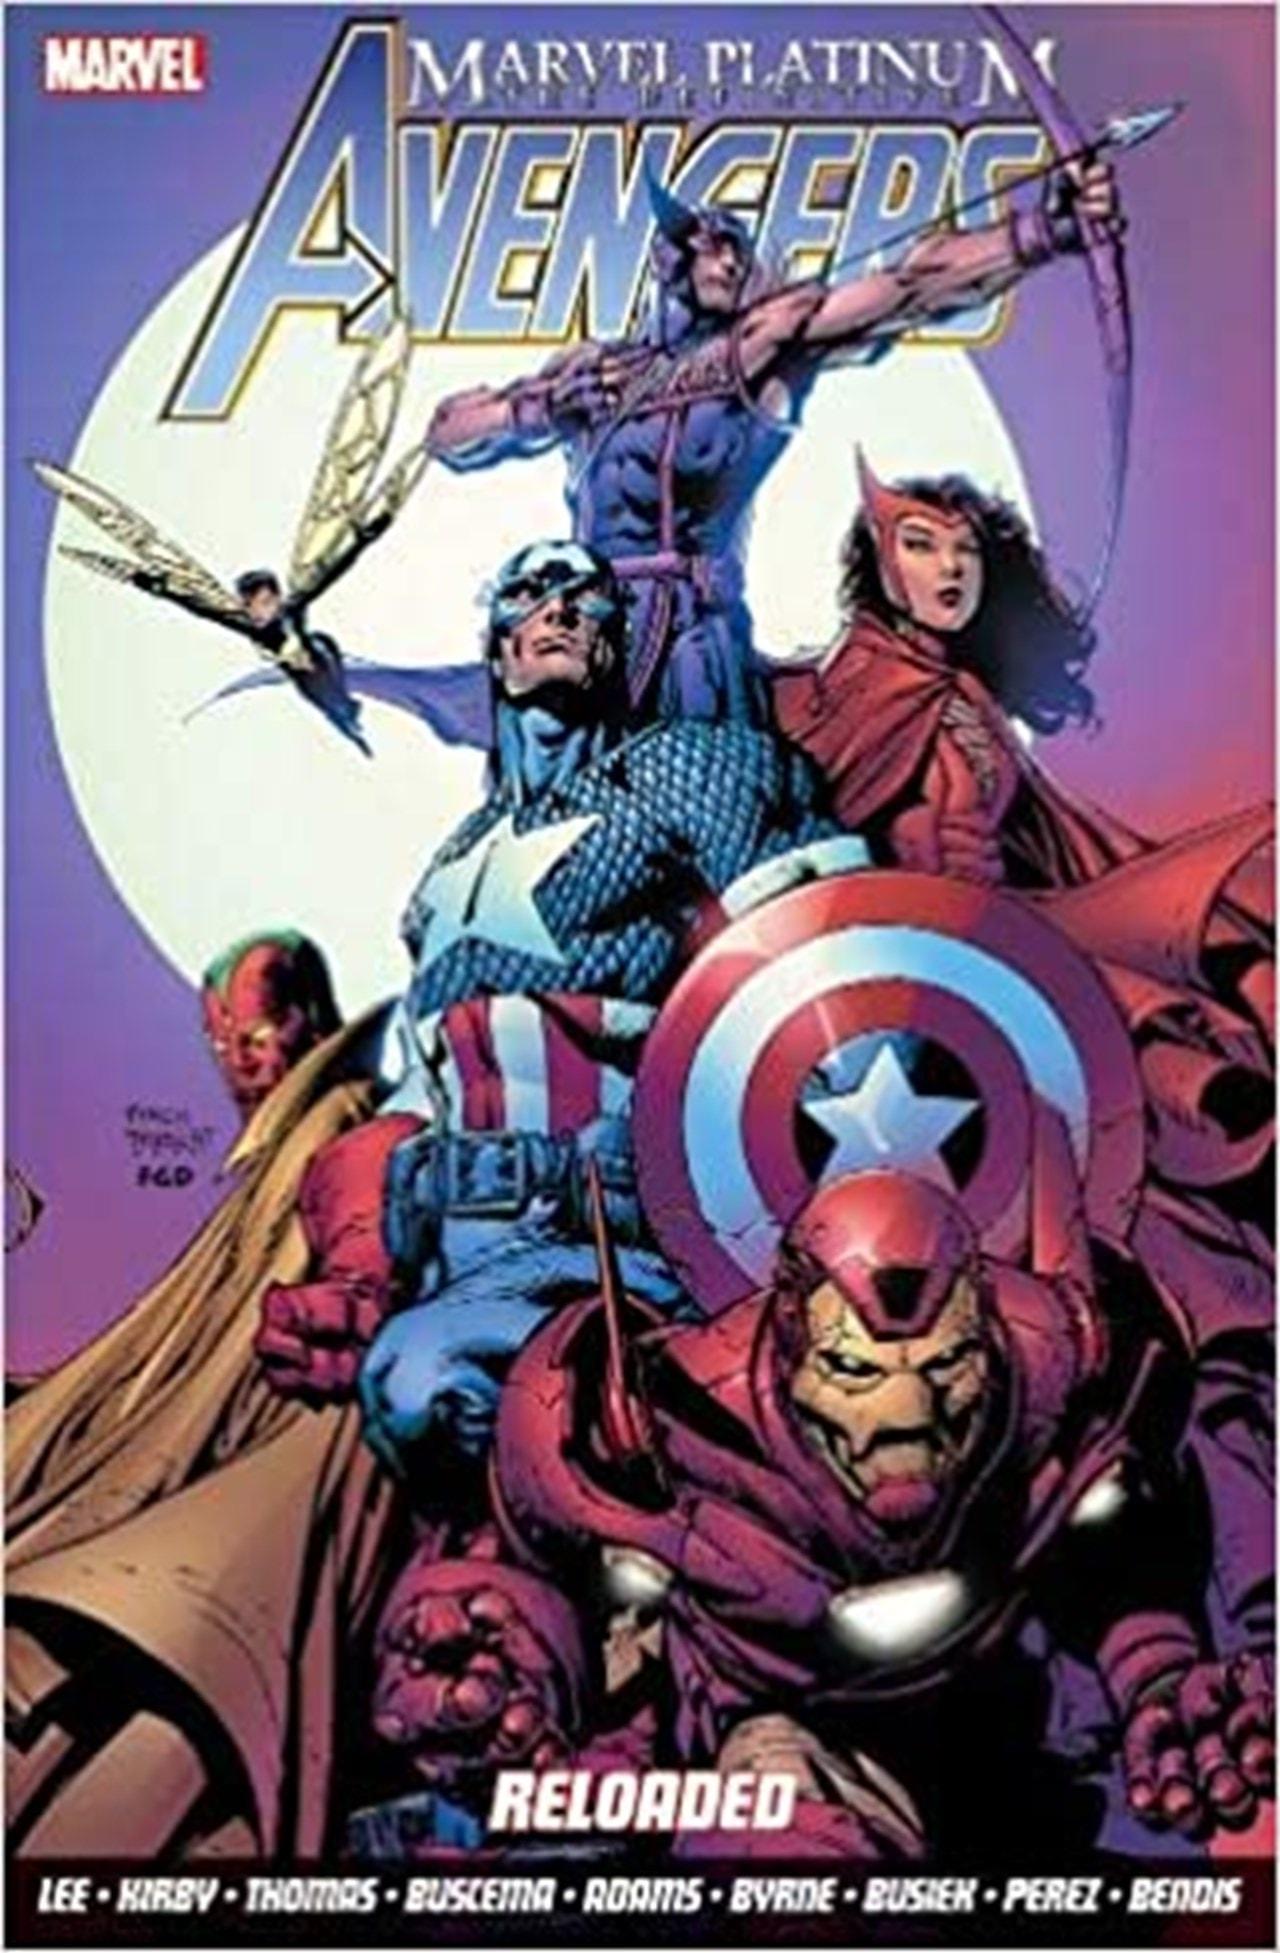 Definitive Avengers Reloaded - 1